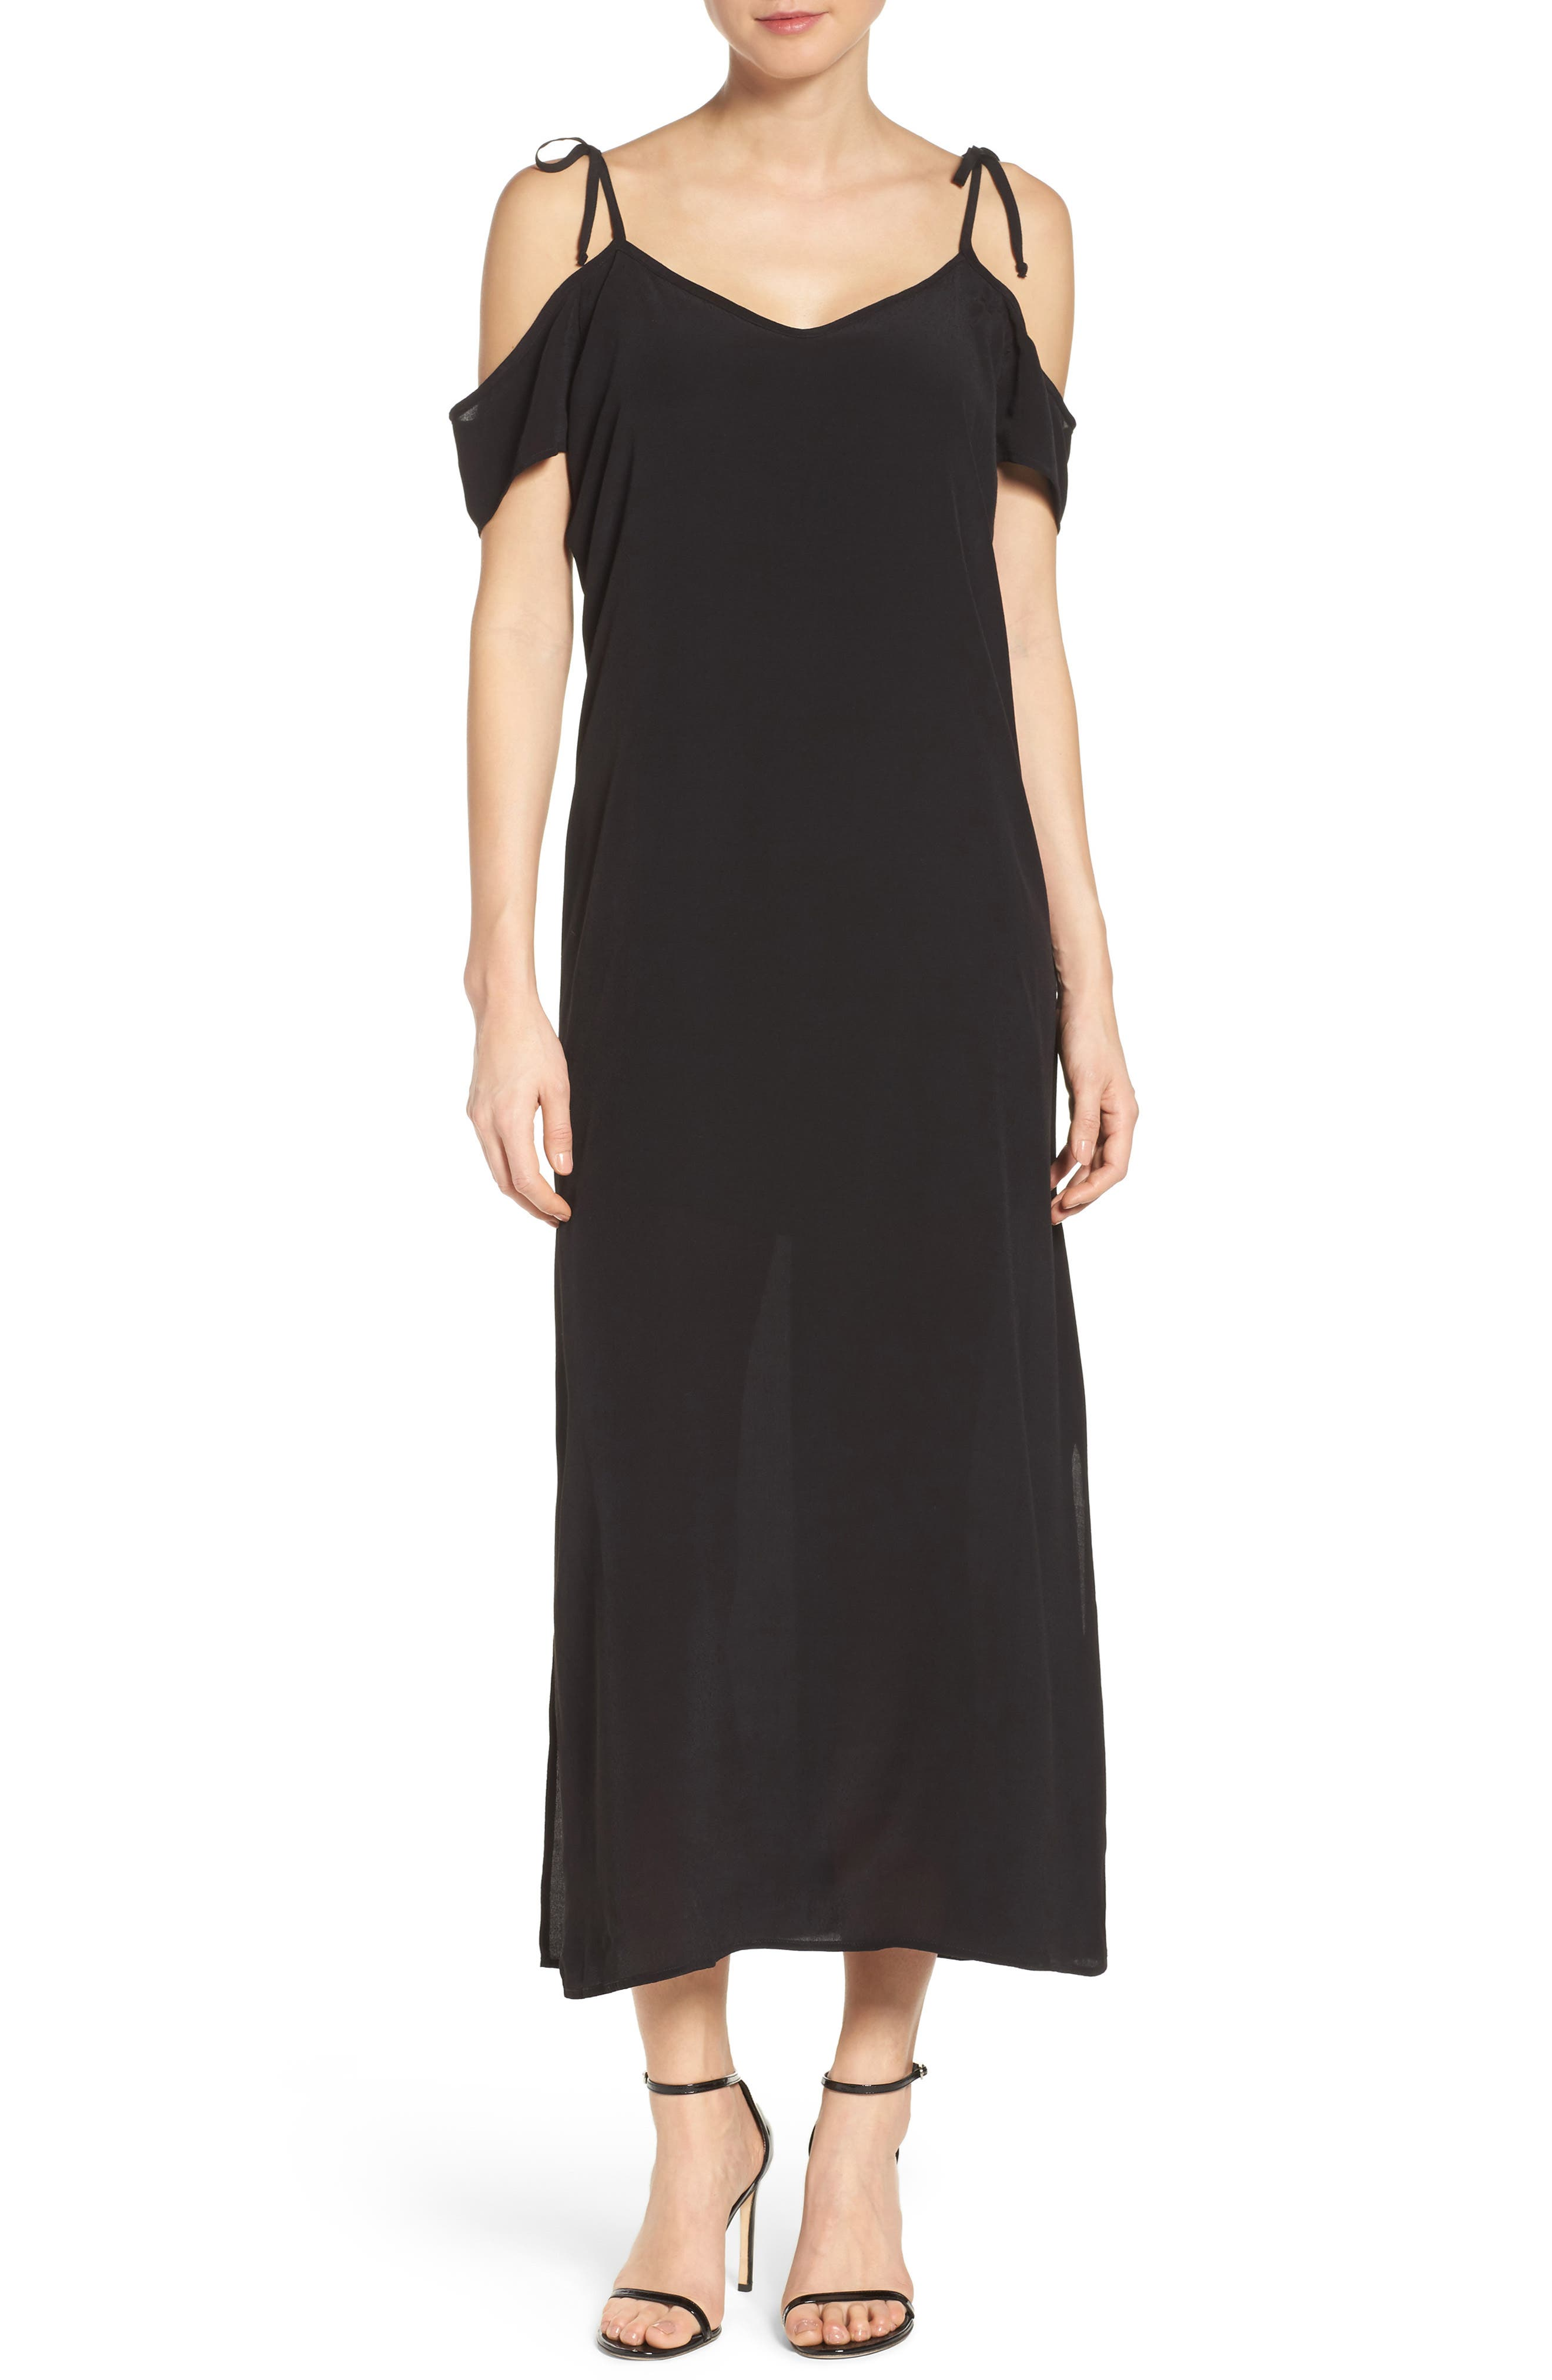 Tie Cold Shoulder Midi Dress,                         Main,                         color, 001